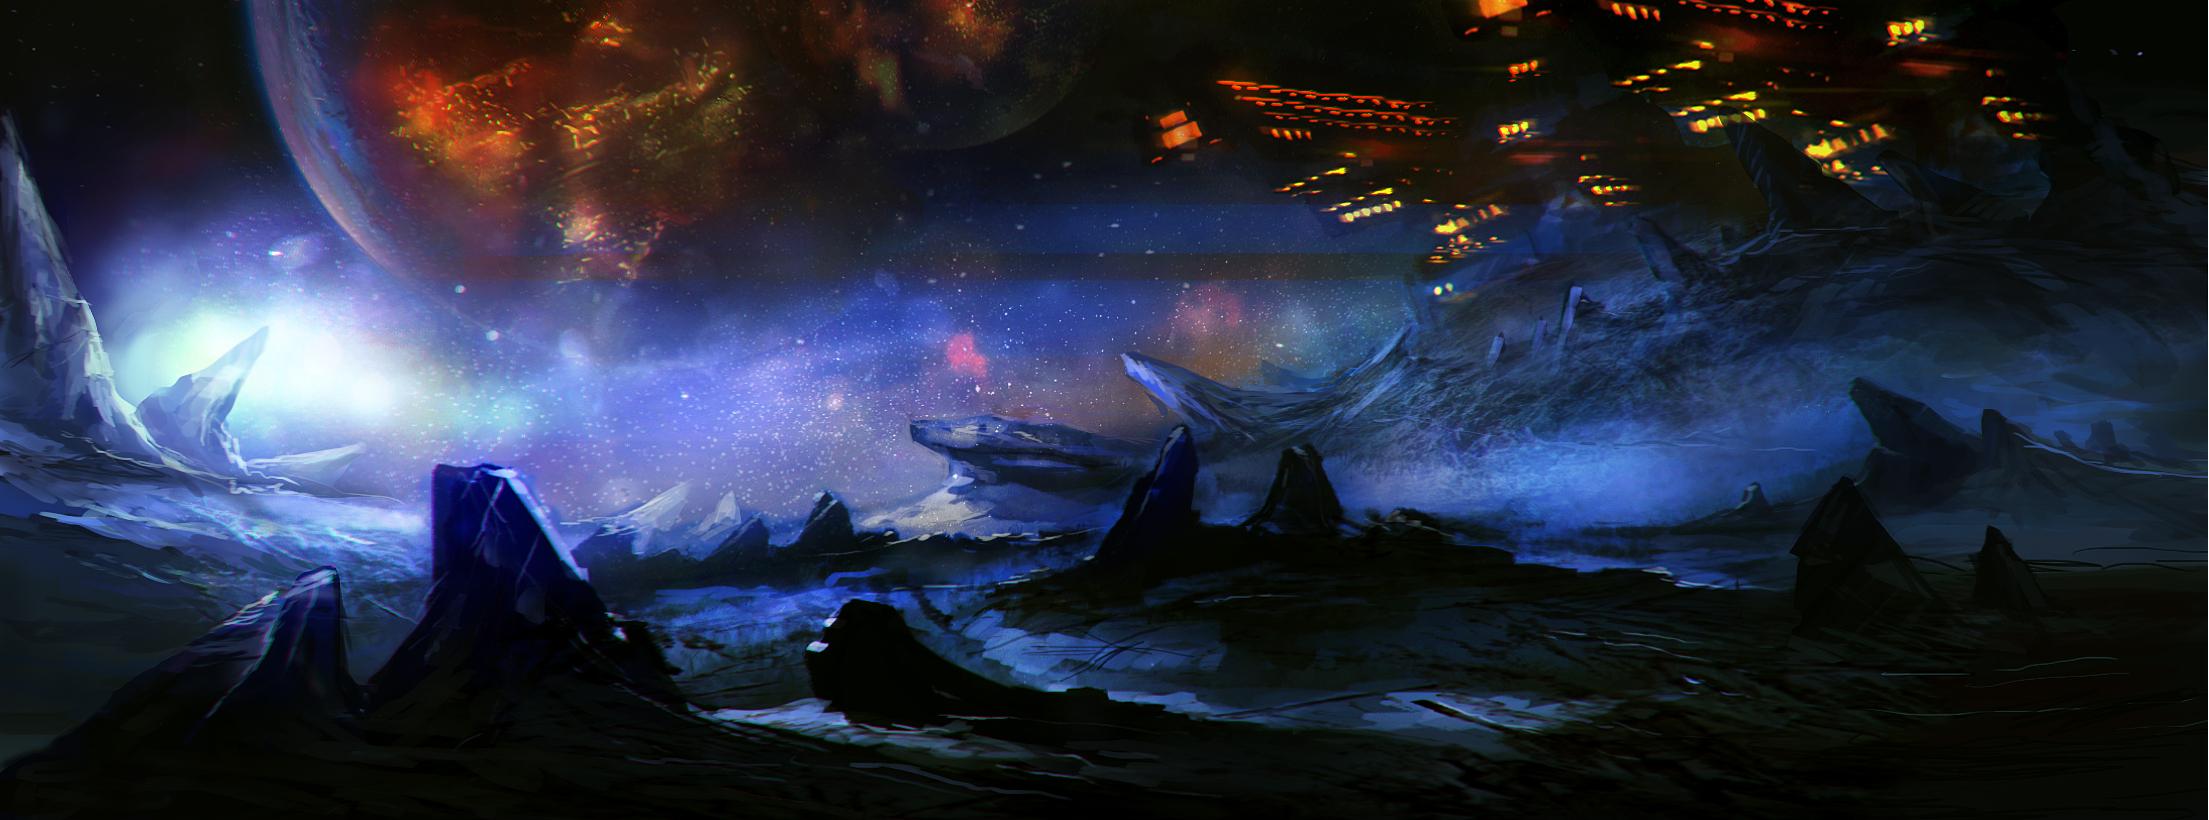 Alien planet base by ecsian on DeviantArt